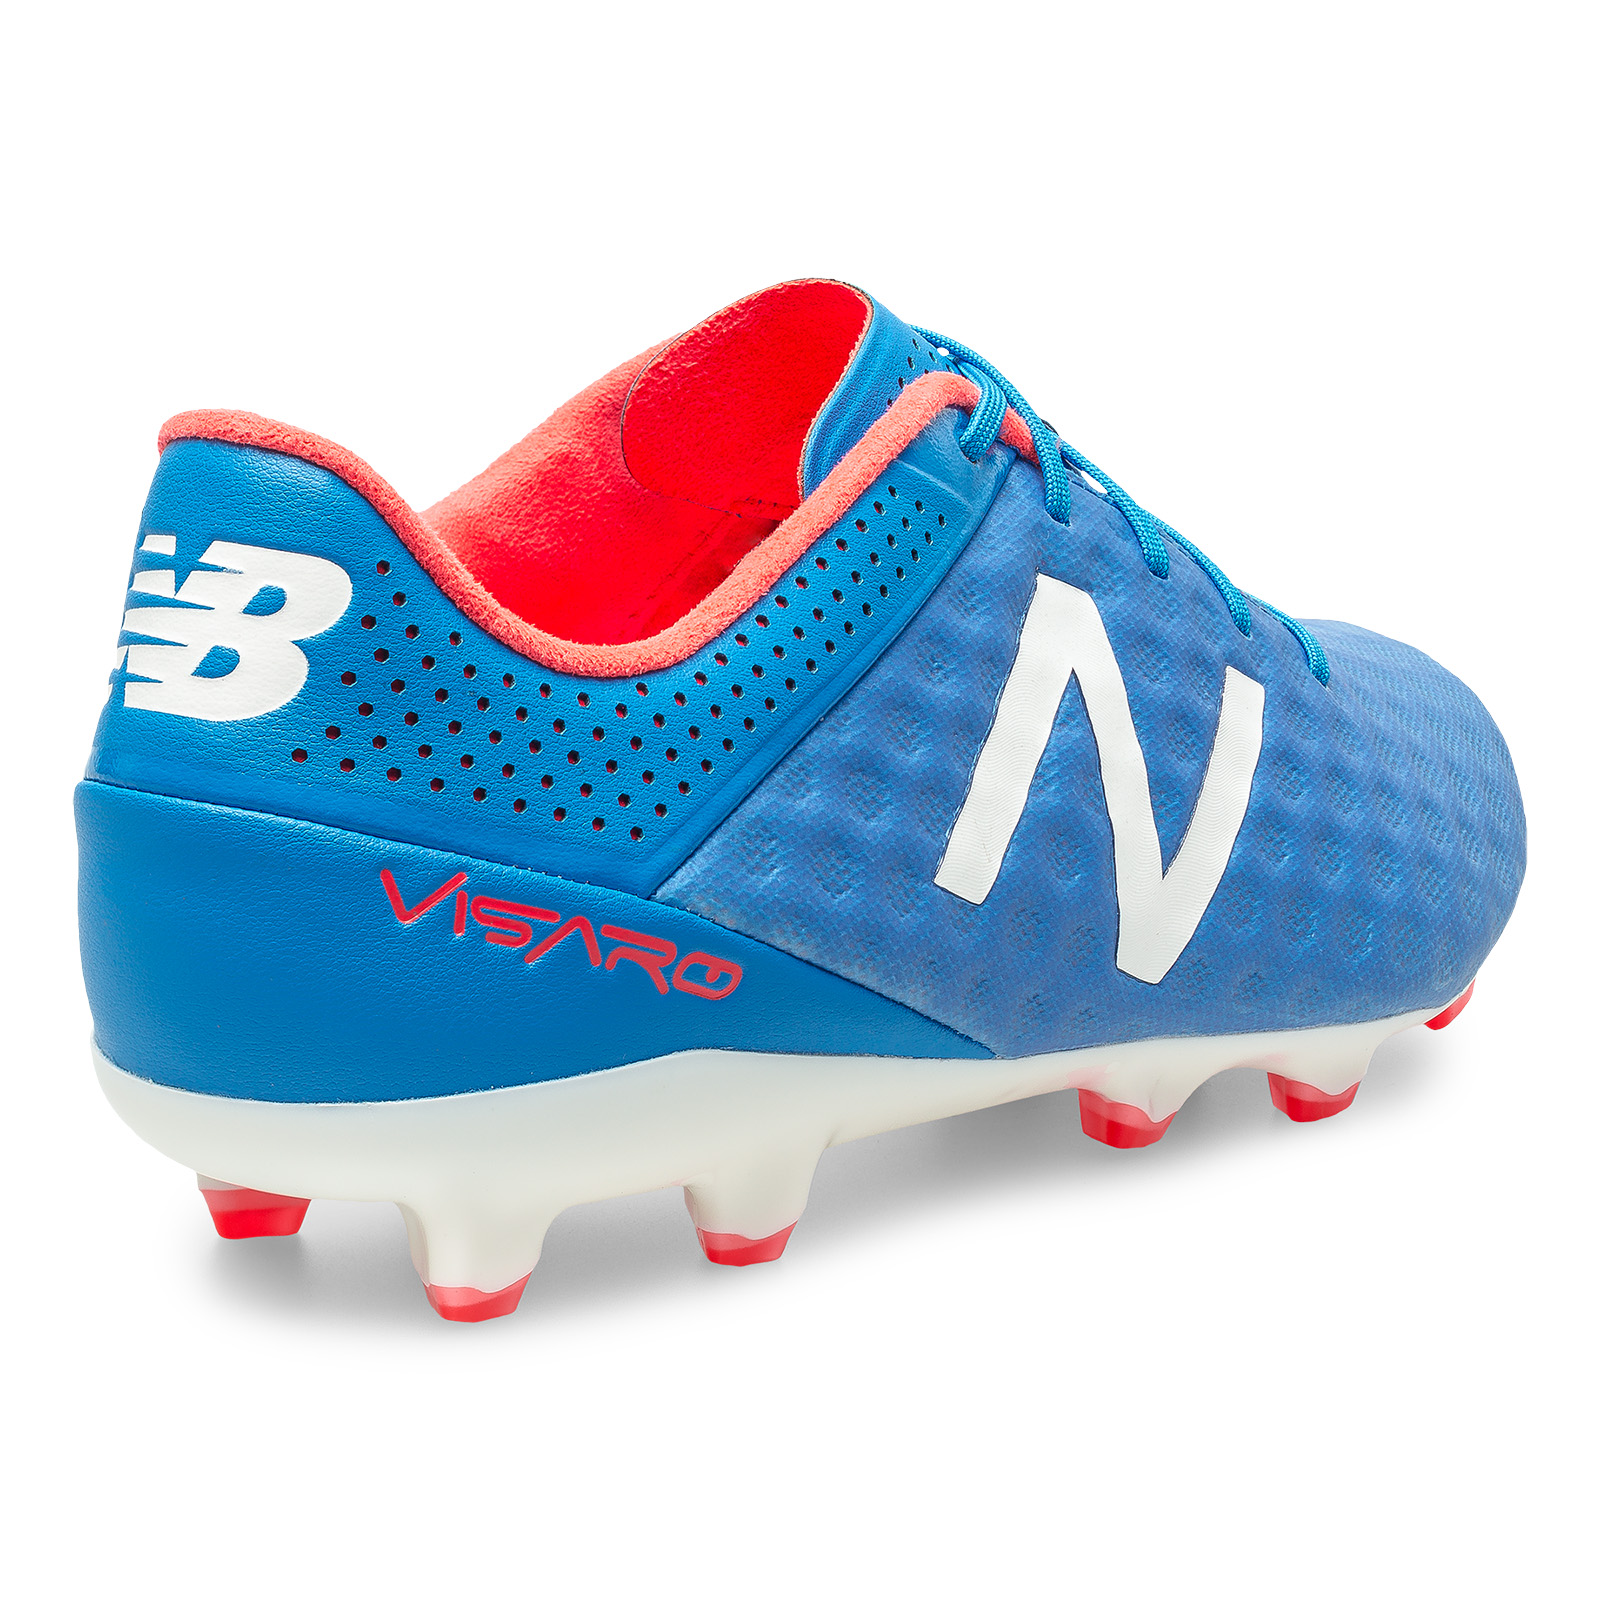 new balance zapatillas de futbol